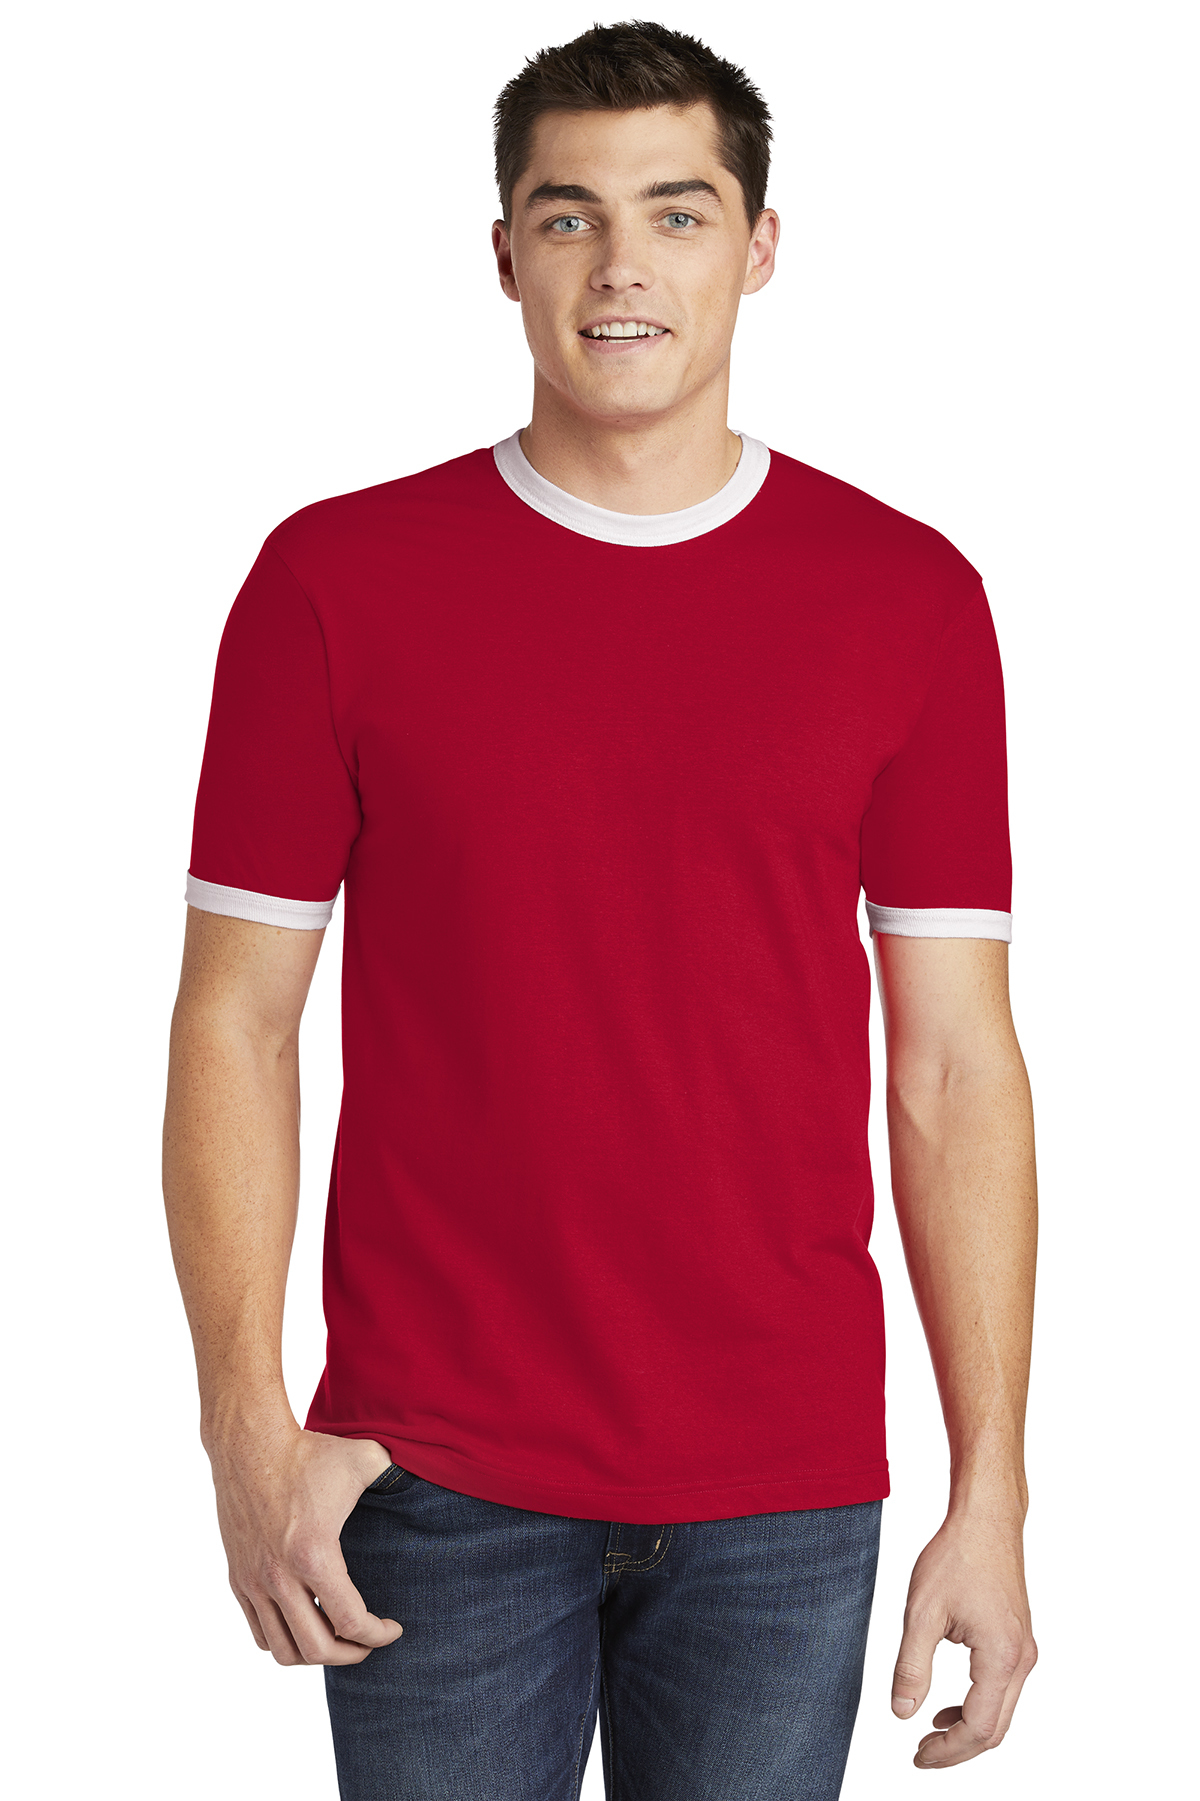 273c1213 American Apparel ® Fine Jersey Ringer T-Shirt | Ring Spun | T-Shirts ...